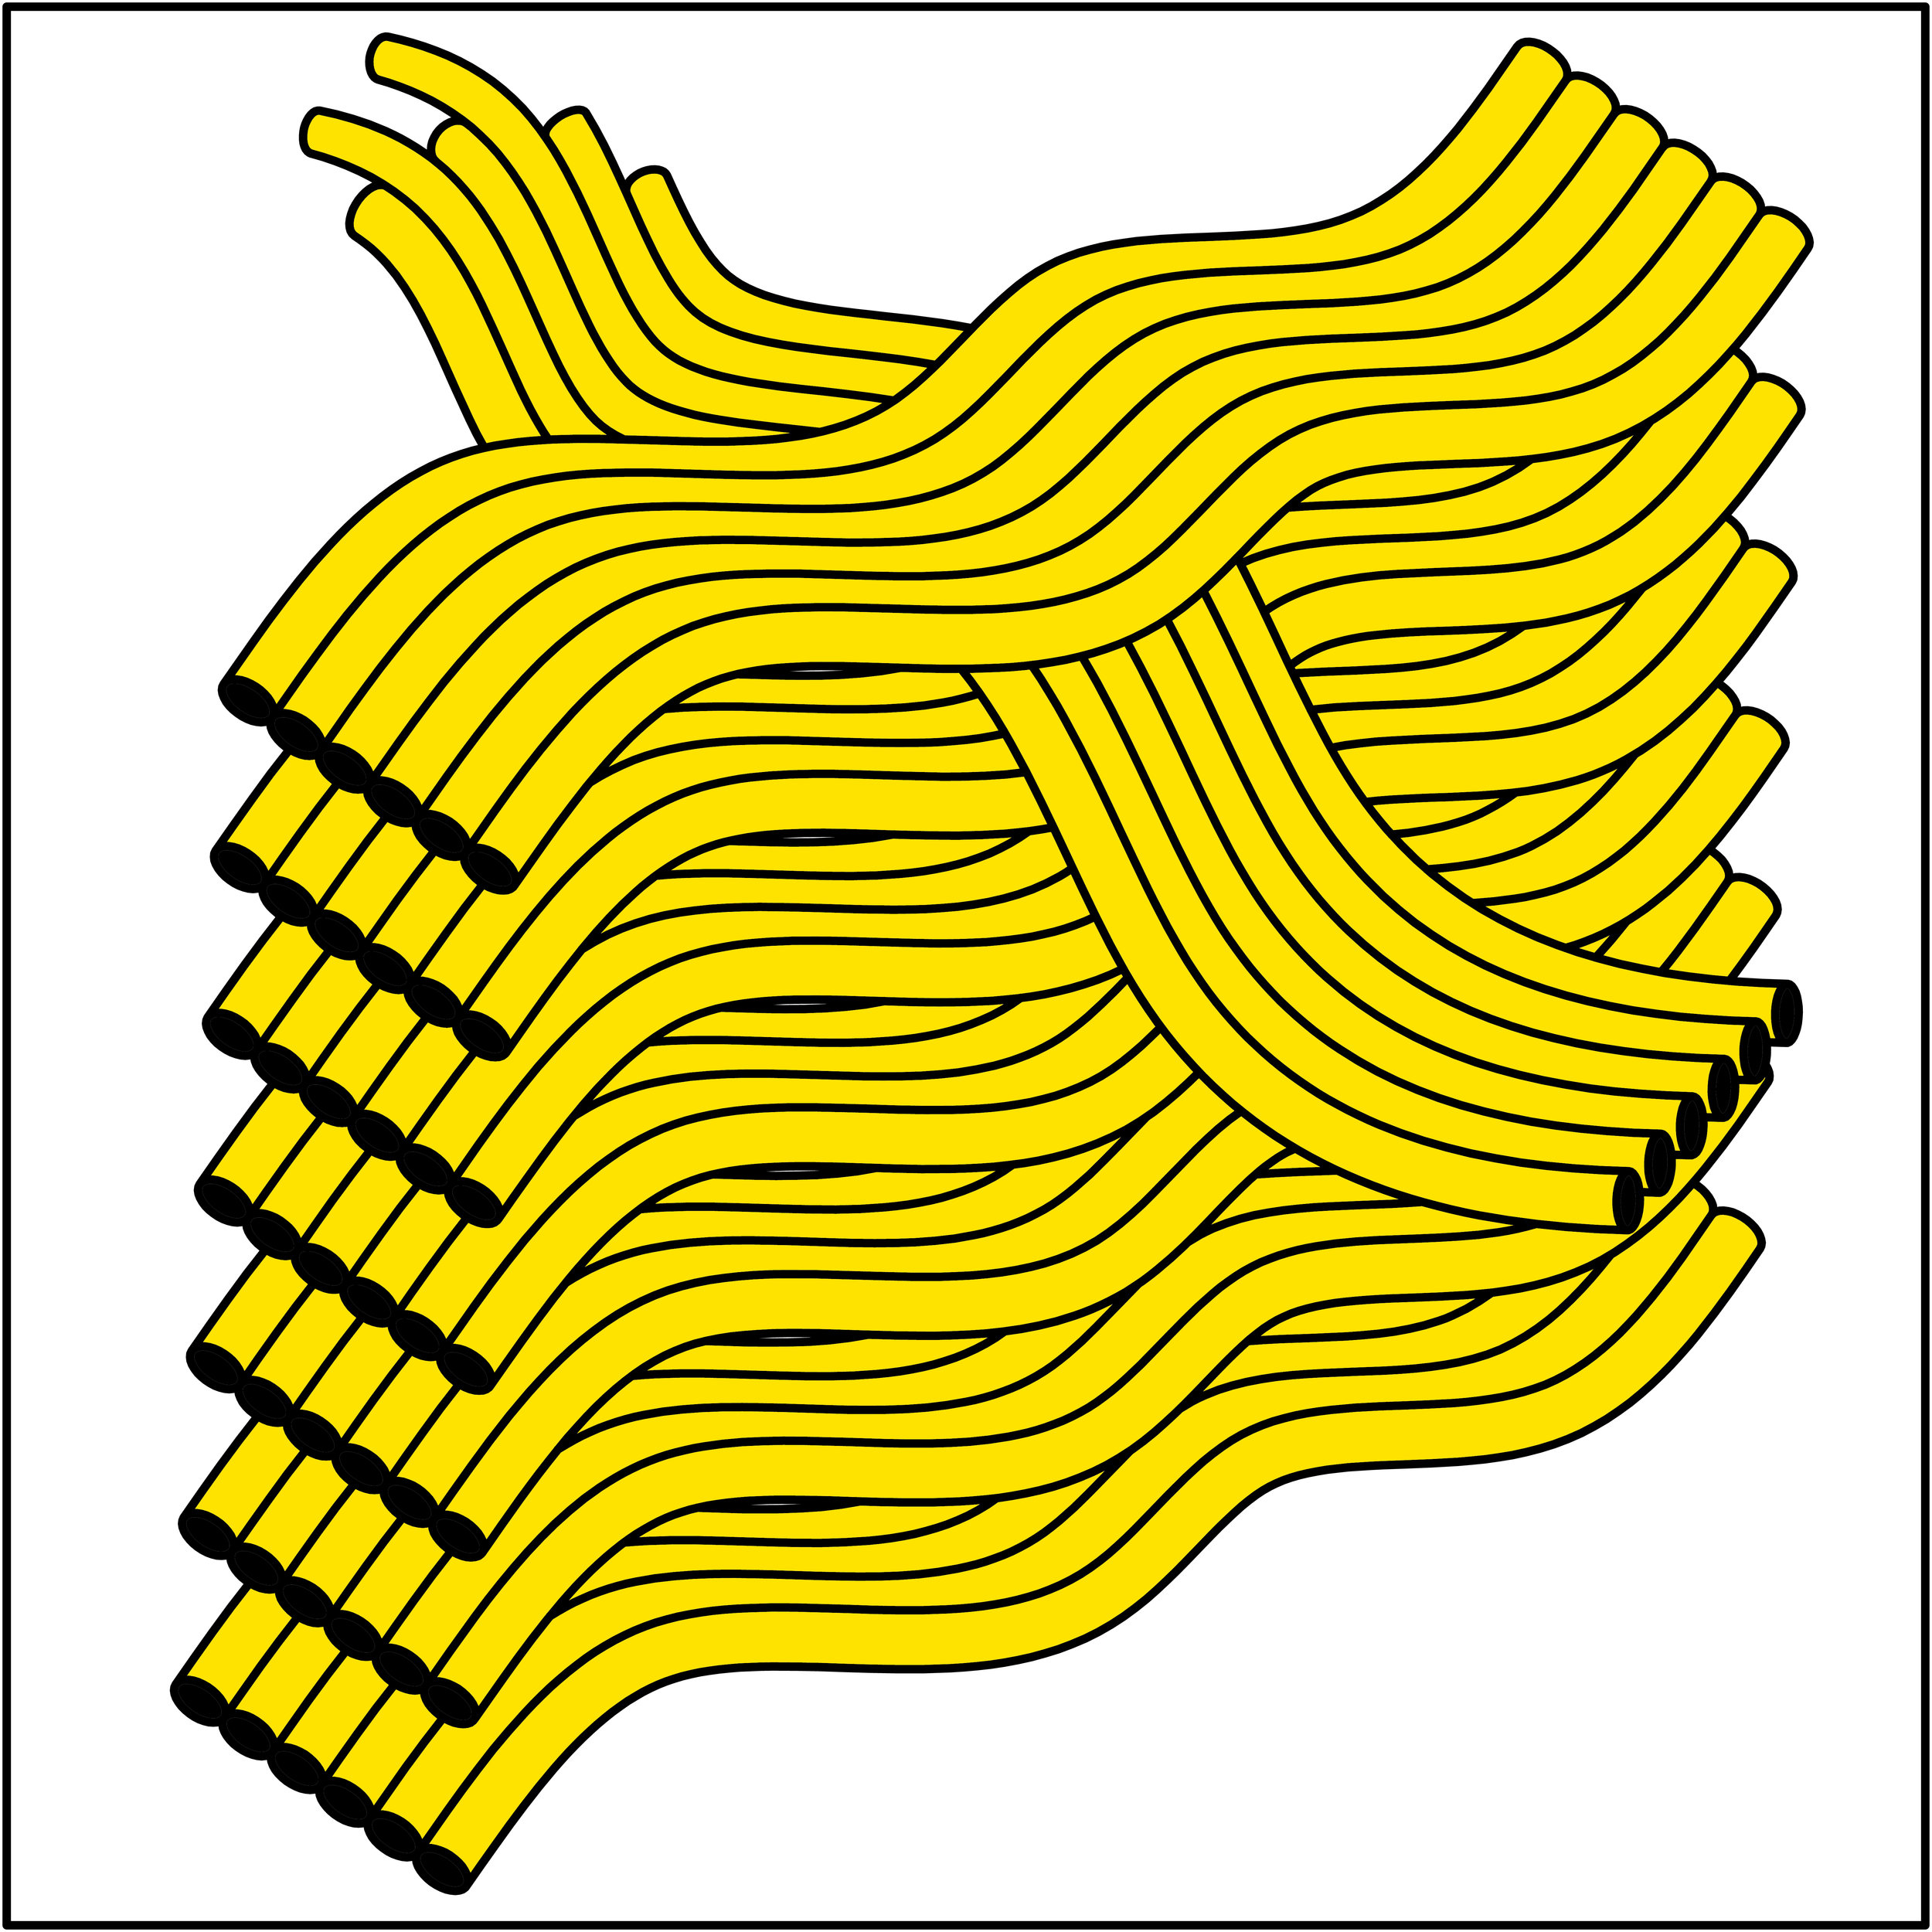 spaghetti yellow - 021.jpg